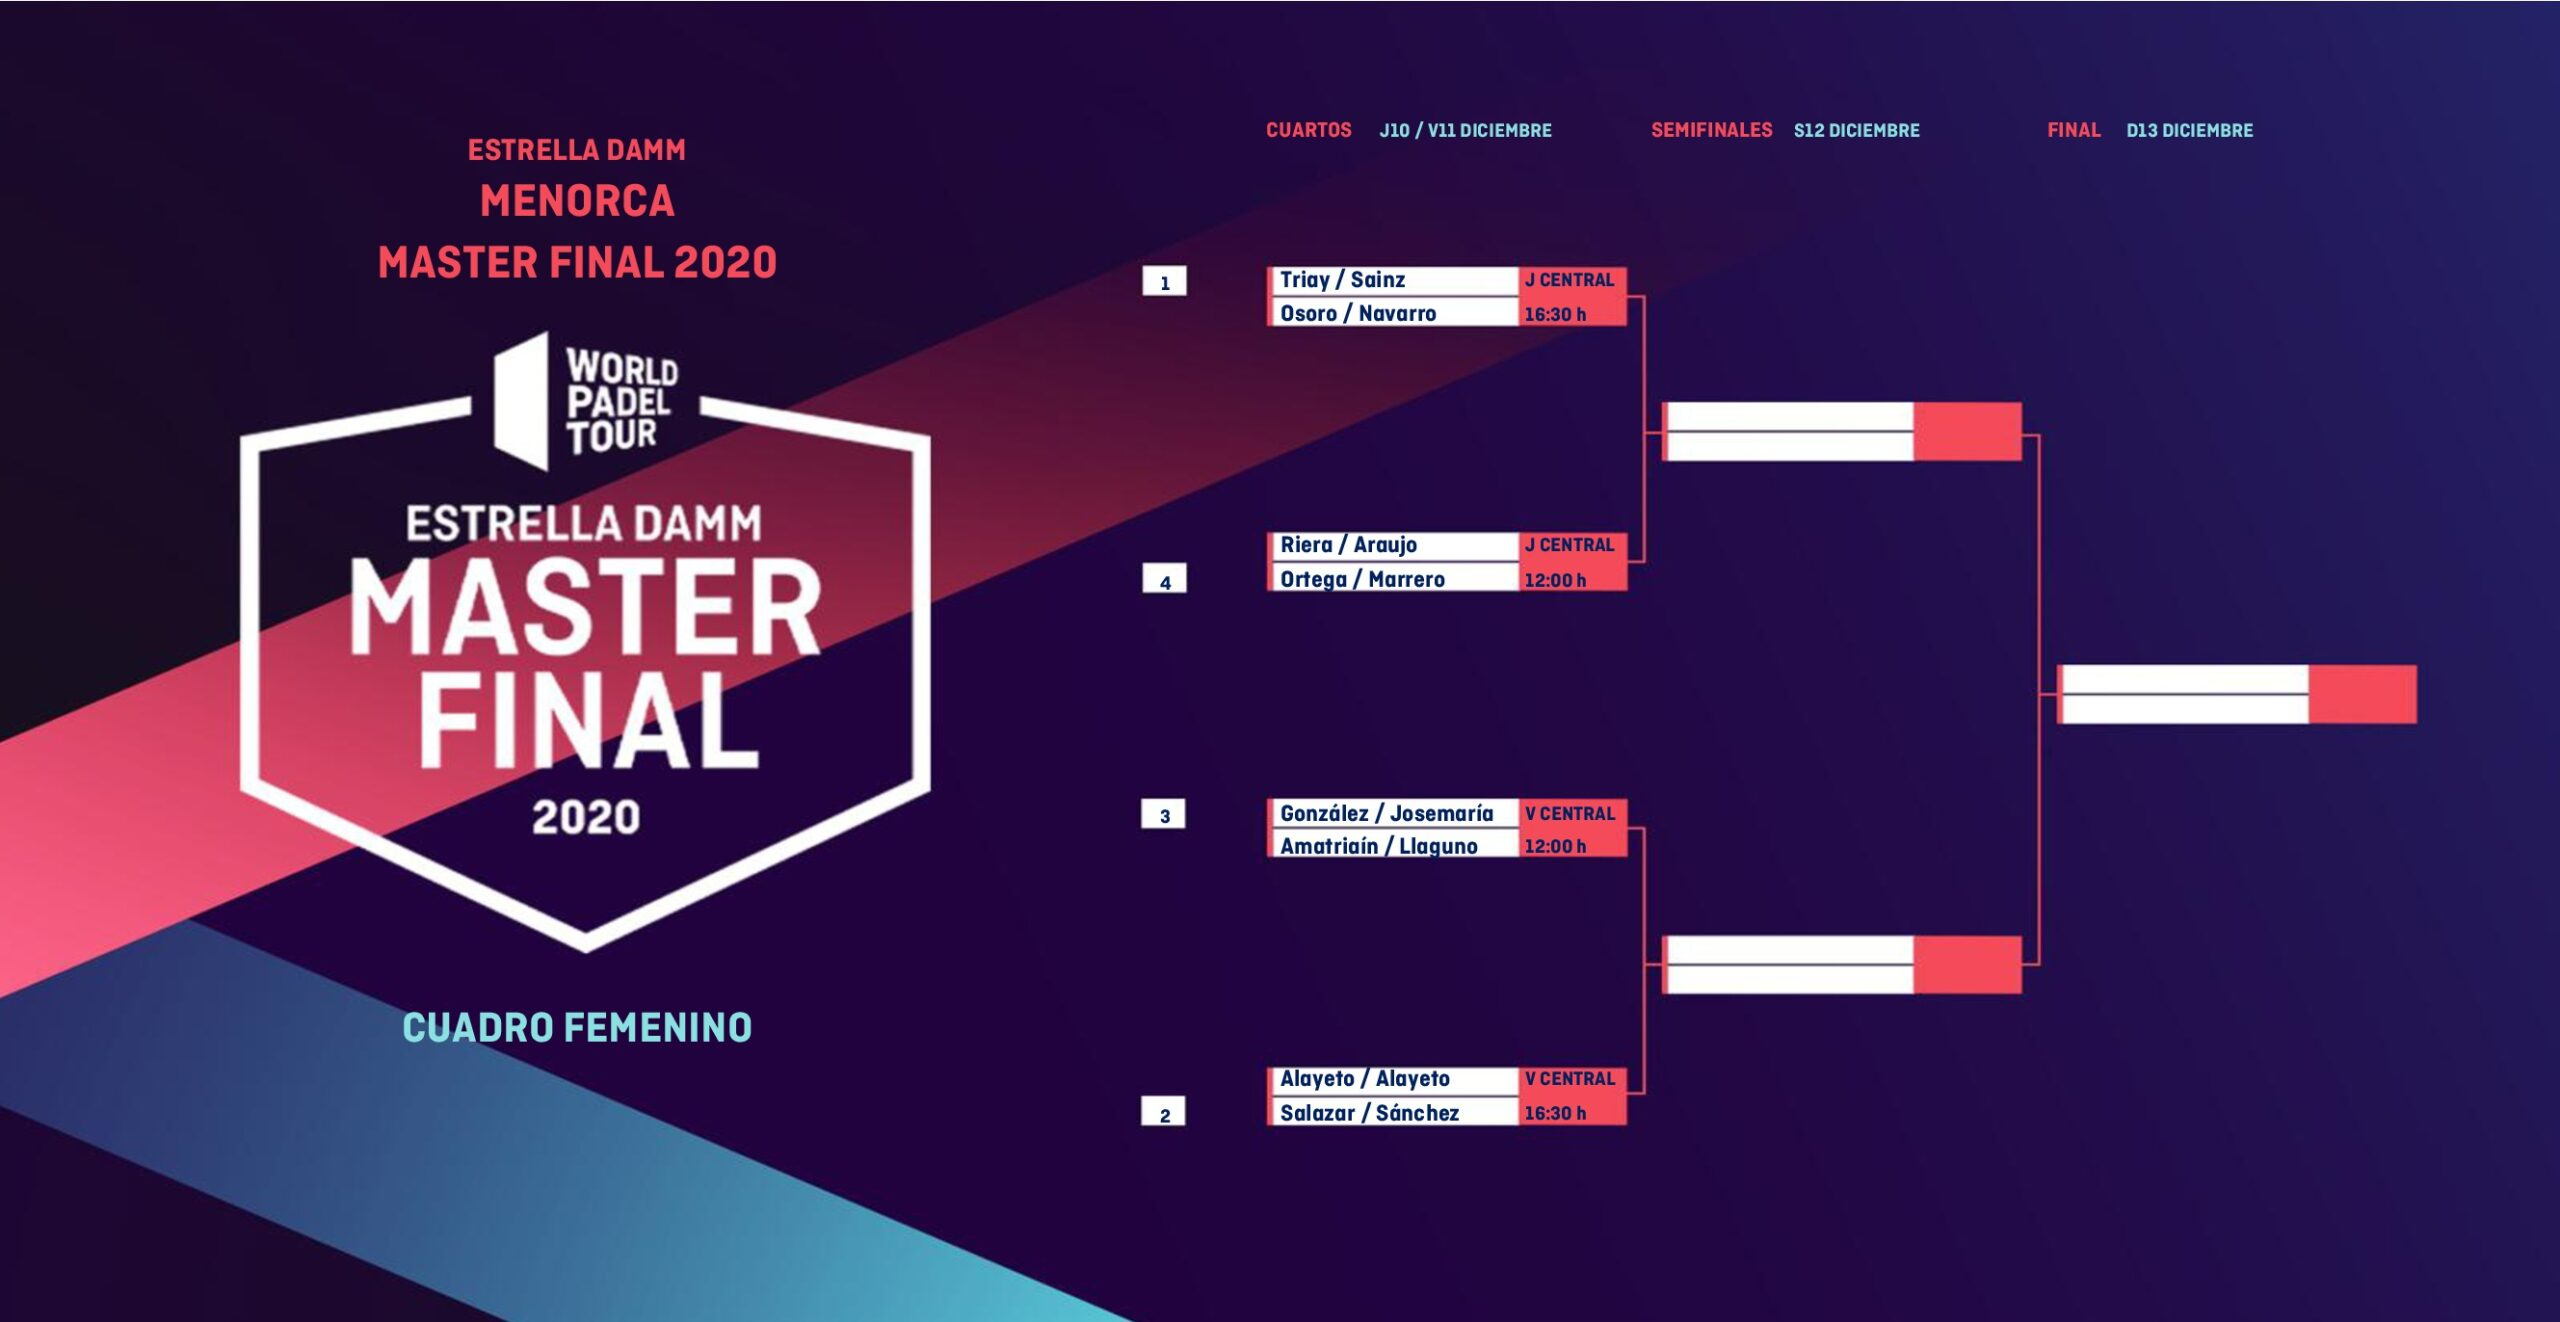 Cuadro femenino del Estrella Damm Menorca Master Final 2020